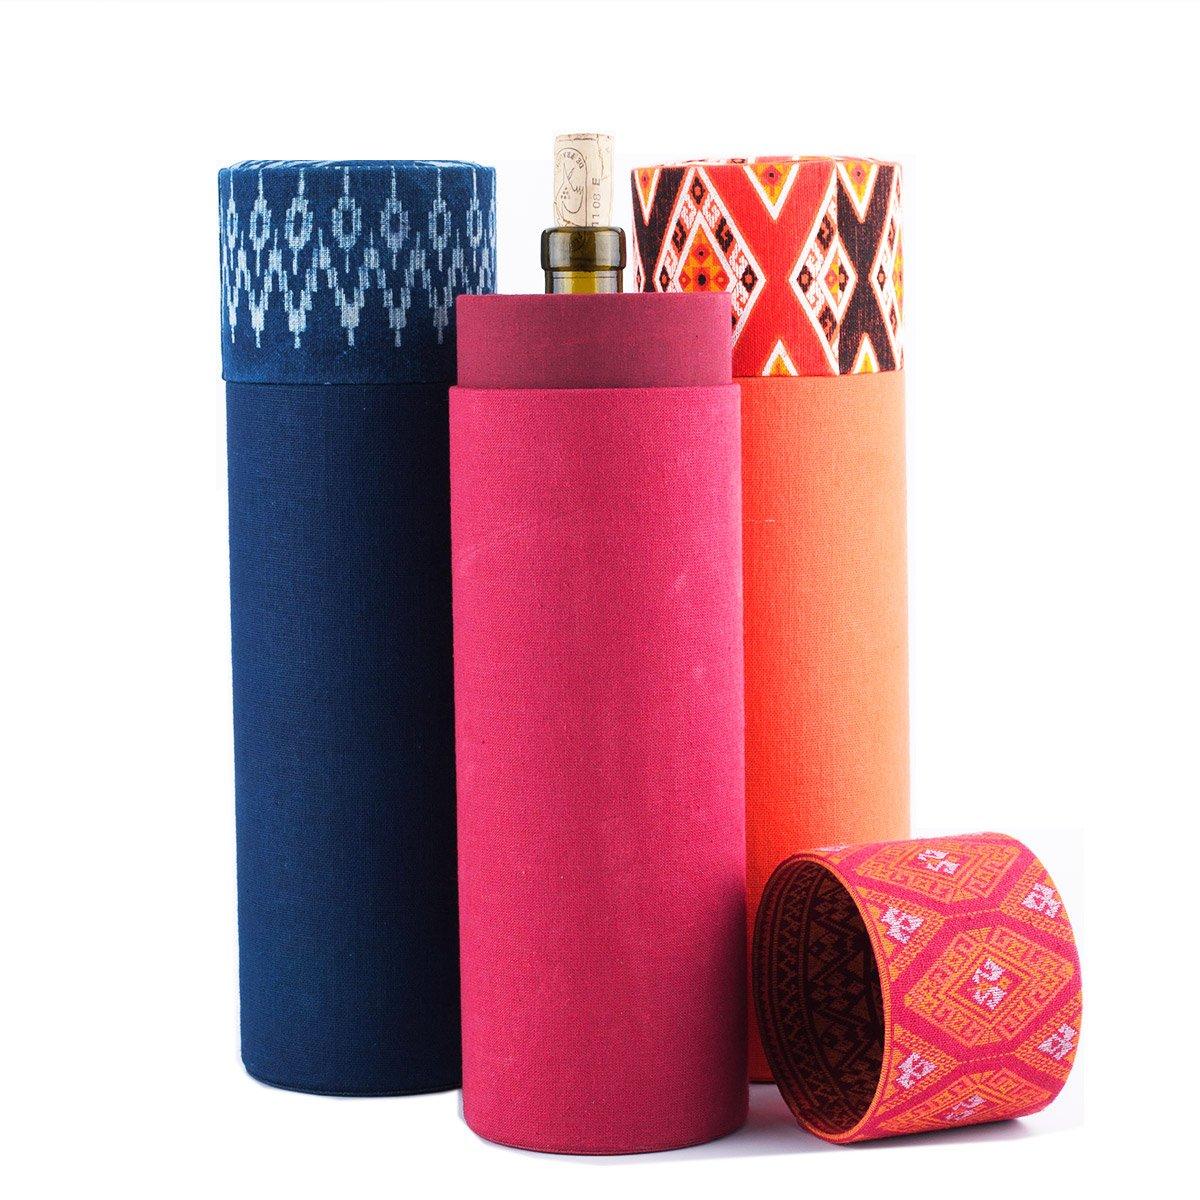 Thailand Mall Wine Gift Box Set 3 Pieces Thai Silk Fabric Blue Red Orange by THAILANDMALL